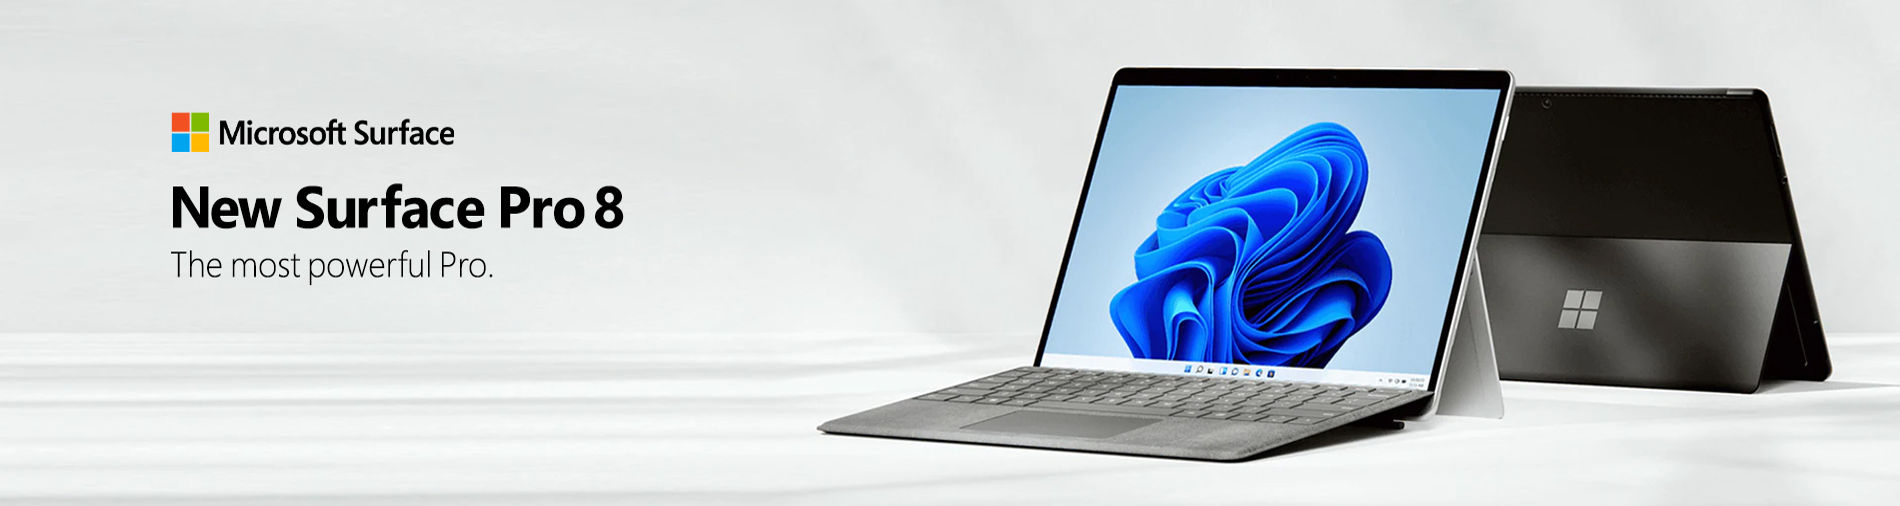 Microsoft Surface Pro8 LP 09.22.banner